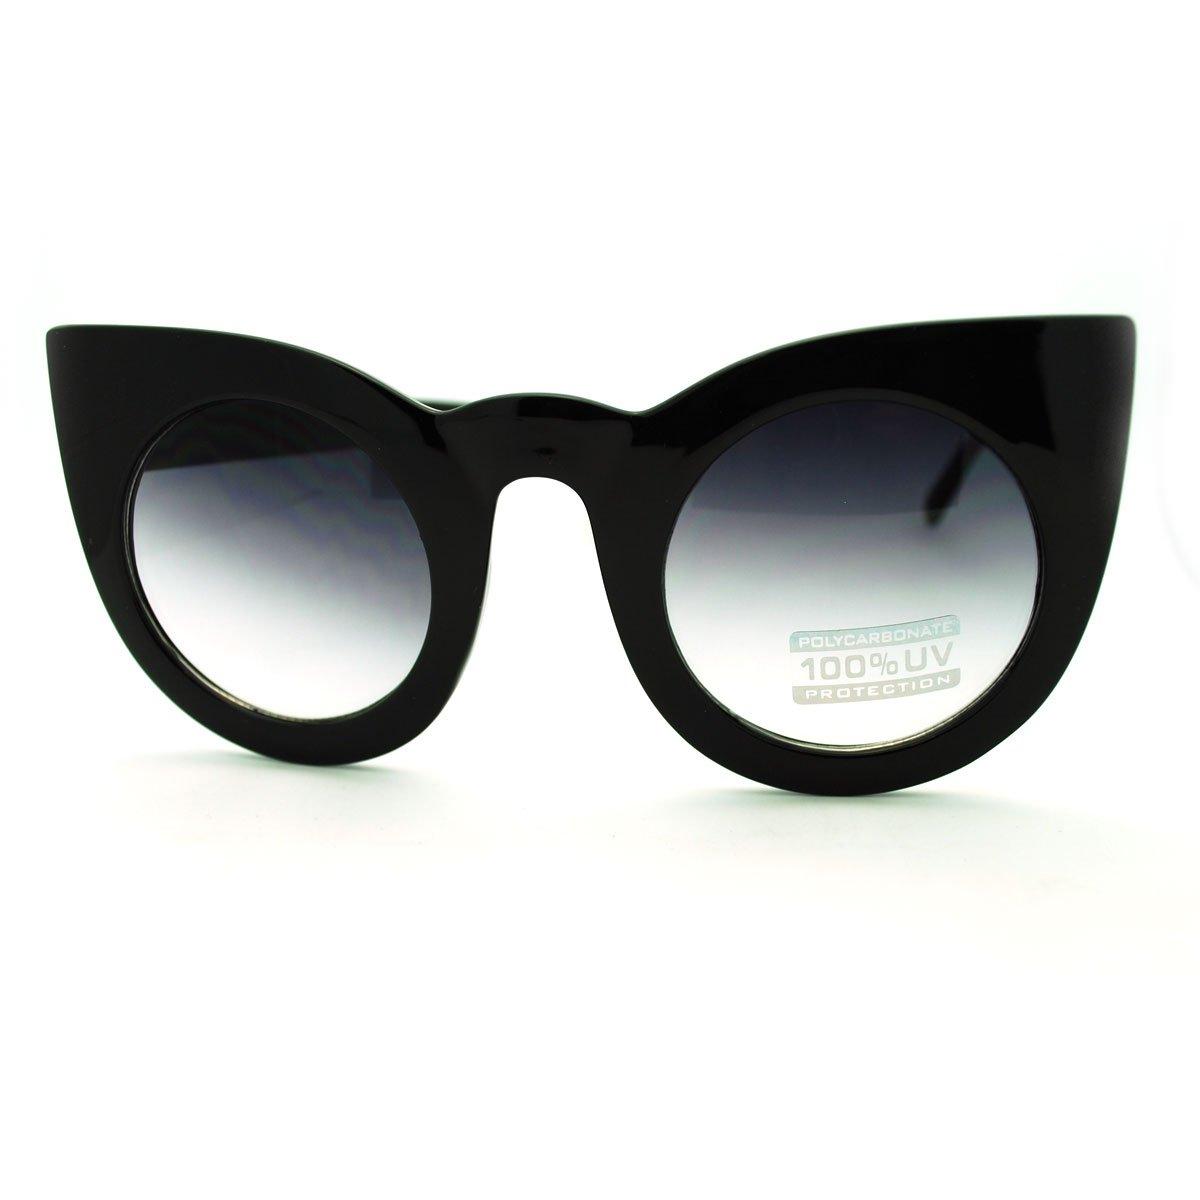 Oversized Round Cateye Sunglasses Womens Vintage Retro Eyewear 0